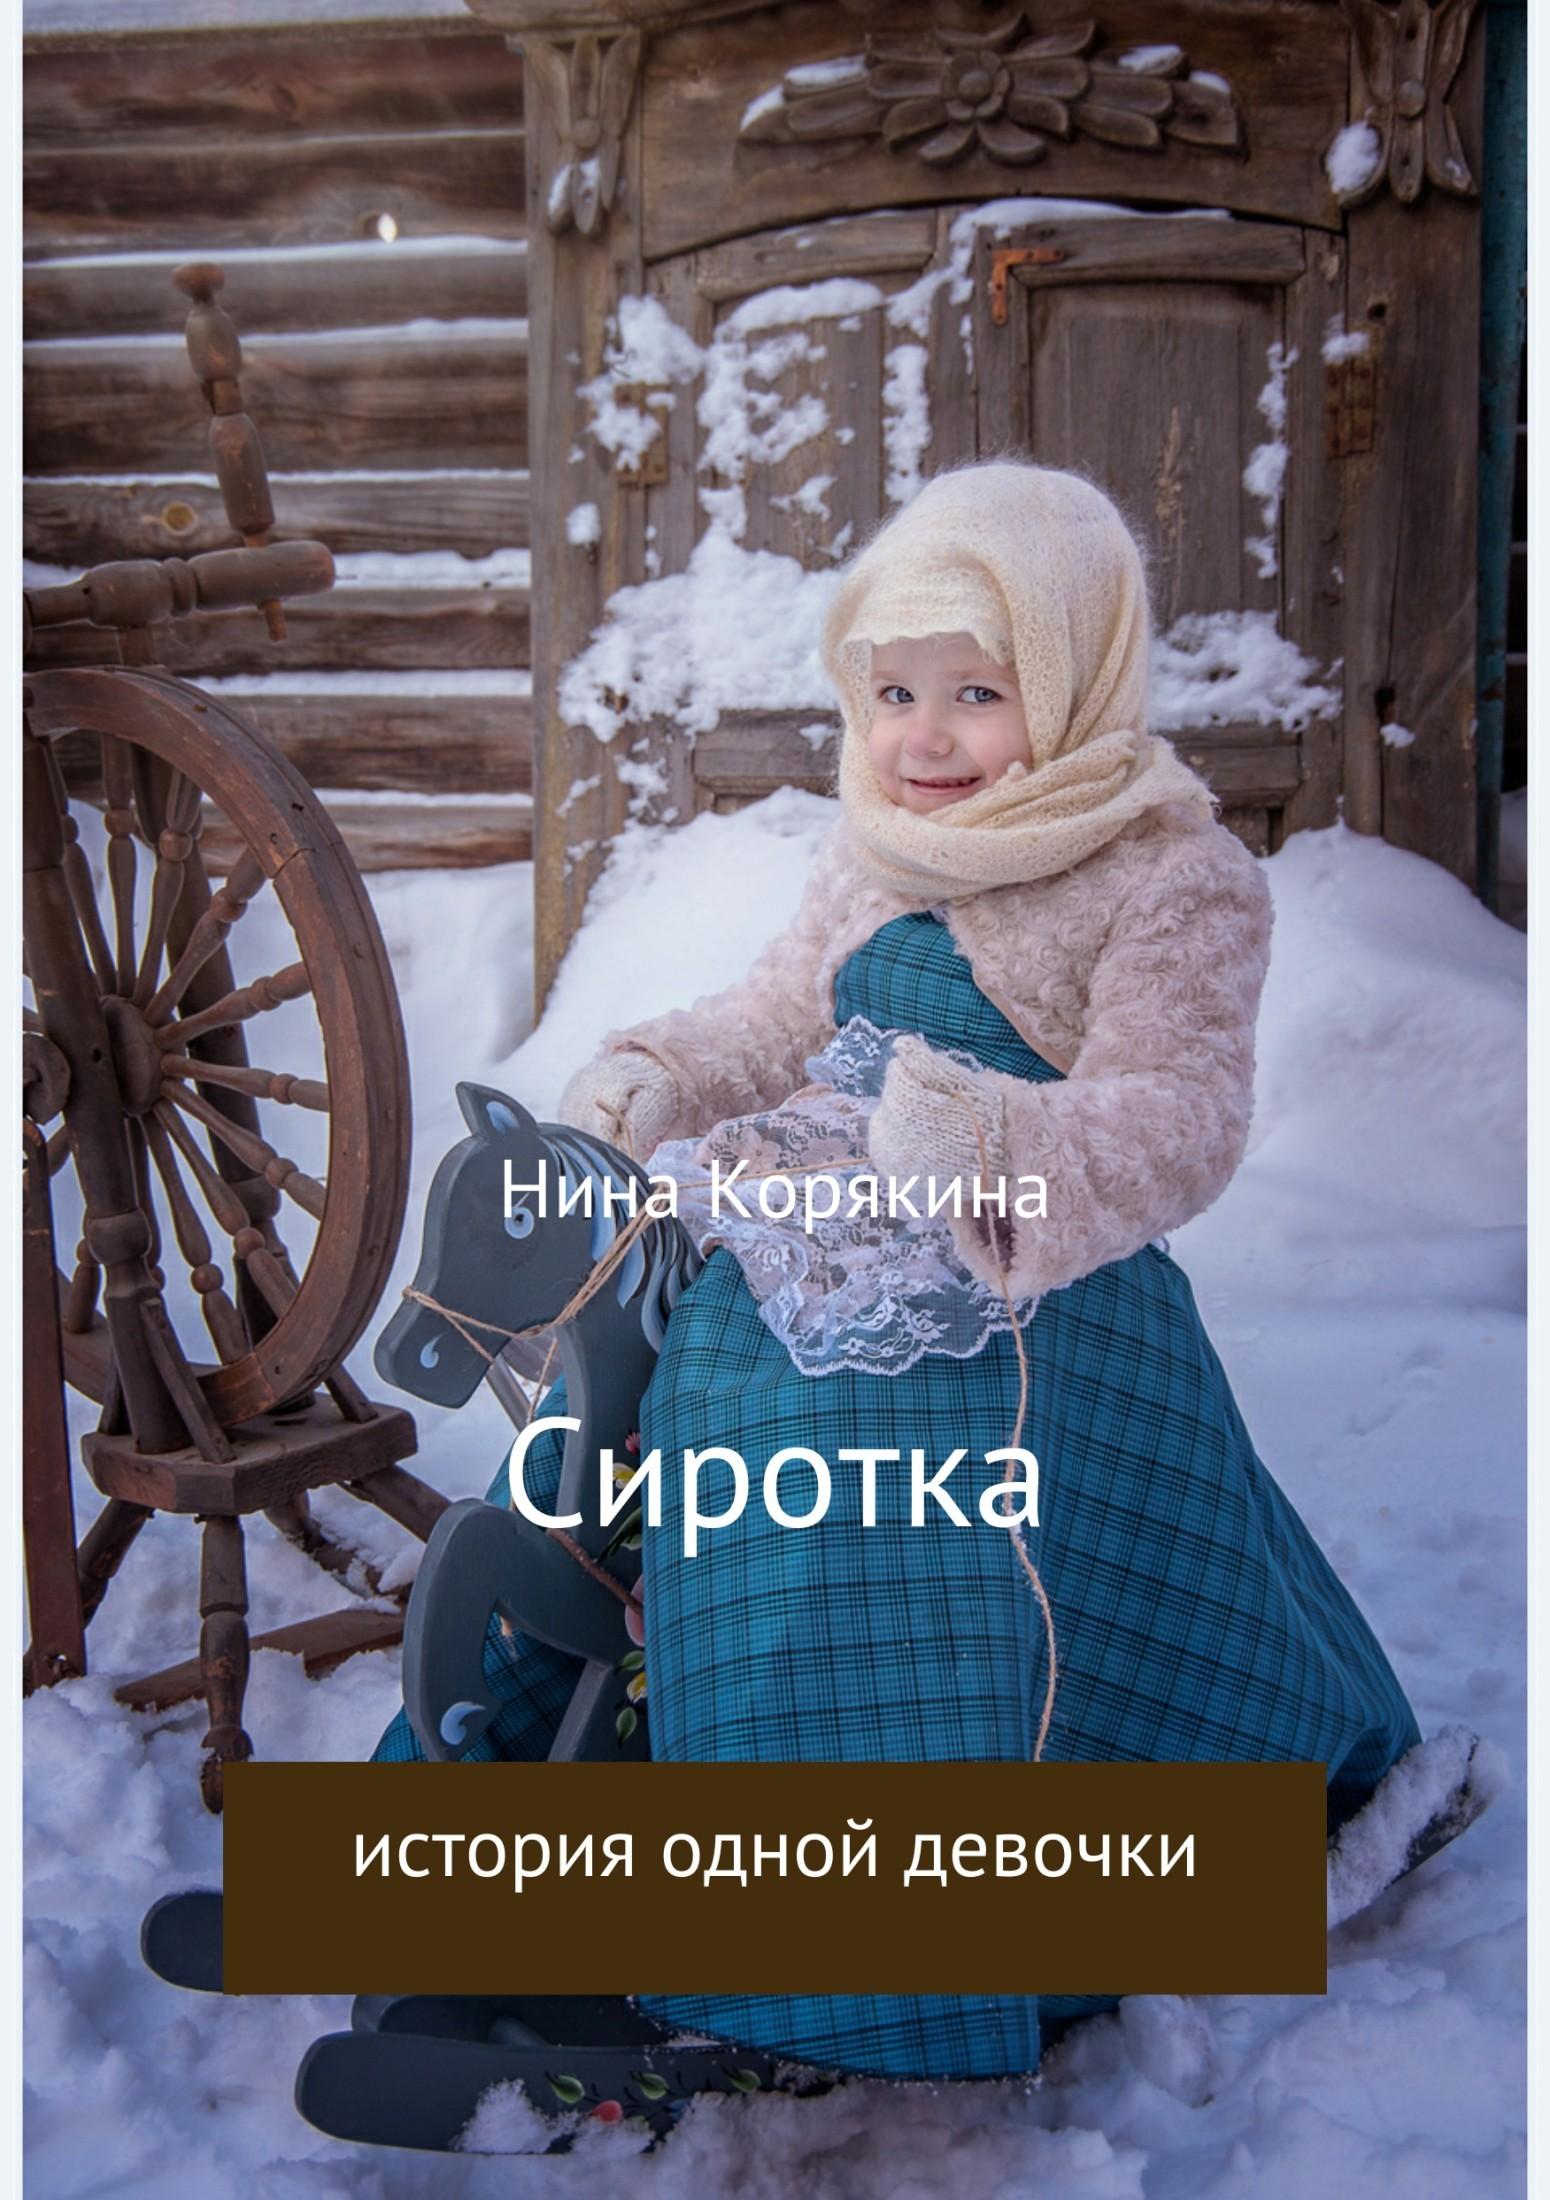 Нина Корякина Сиротка нина ананиашвили андрис лиепа такой короткий век… dvd